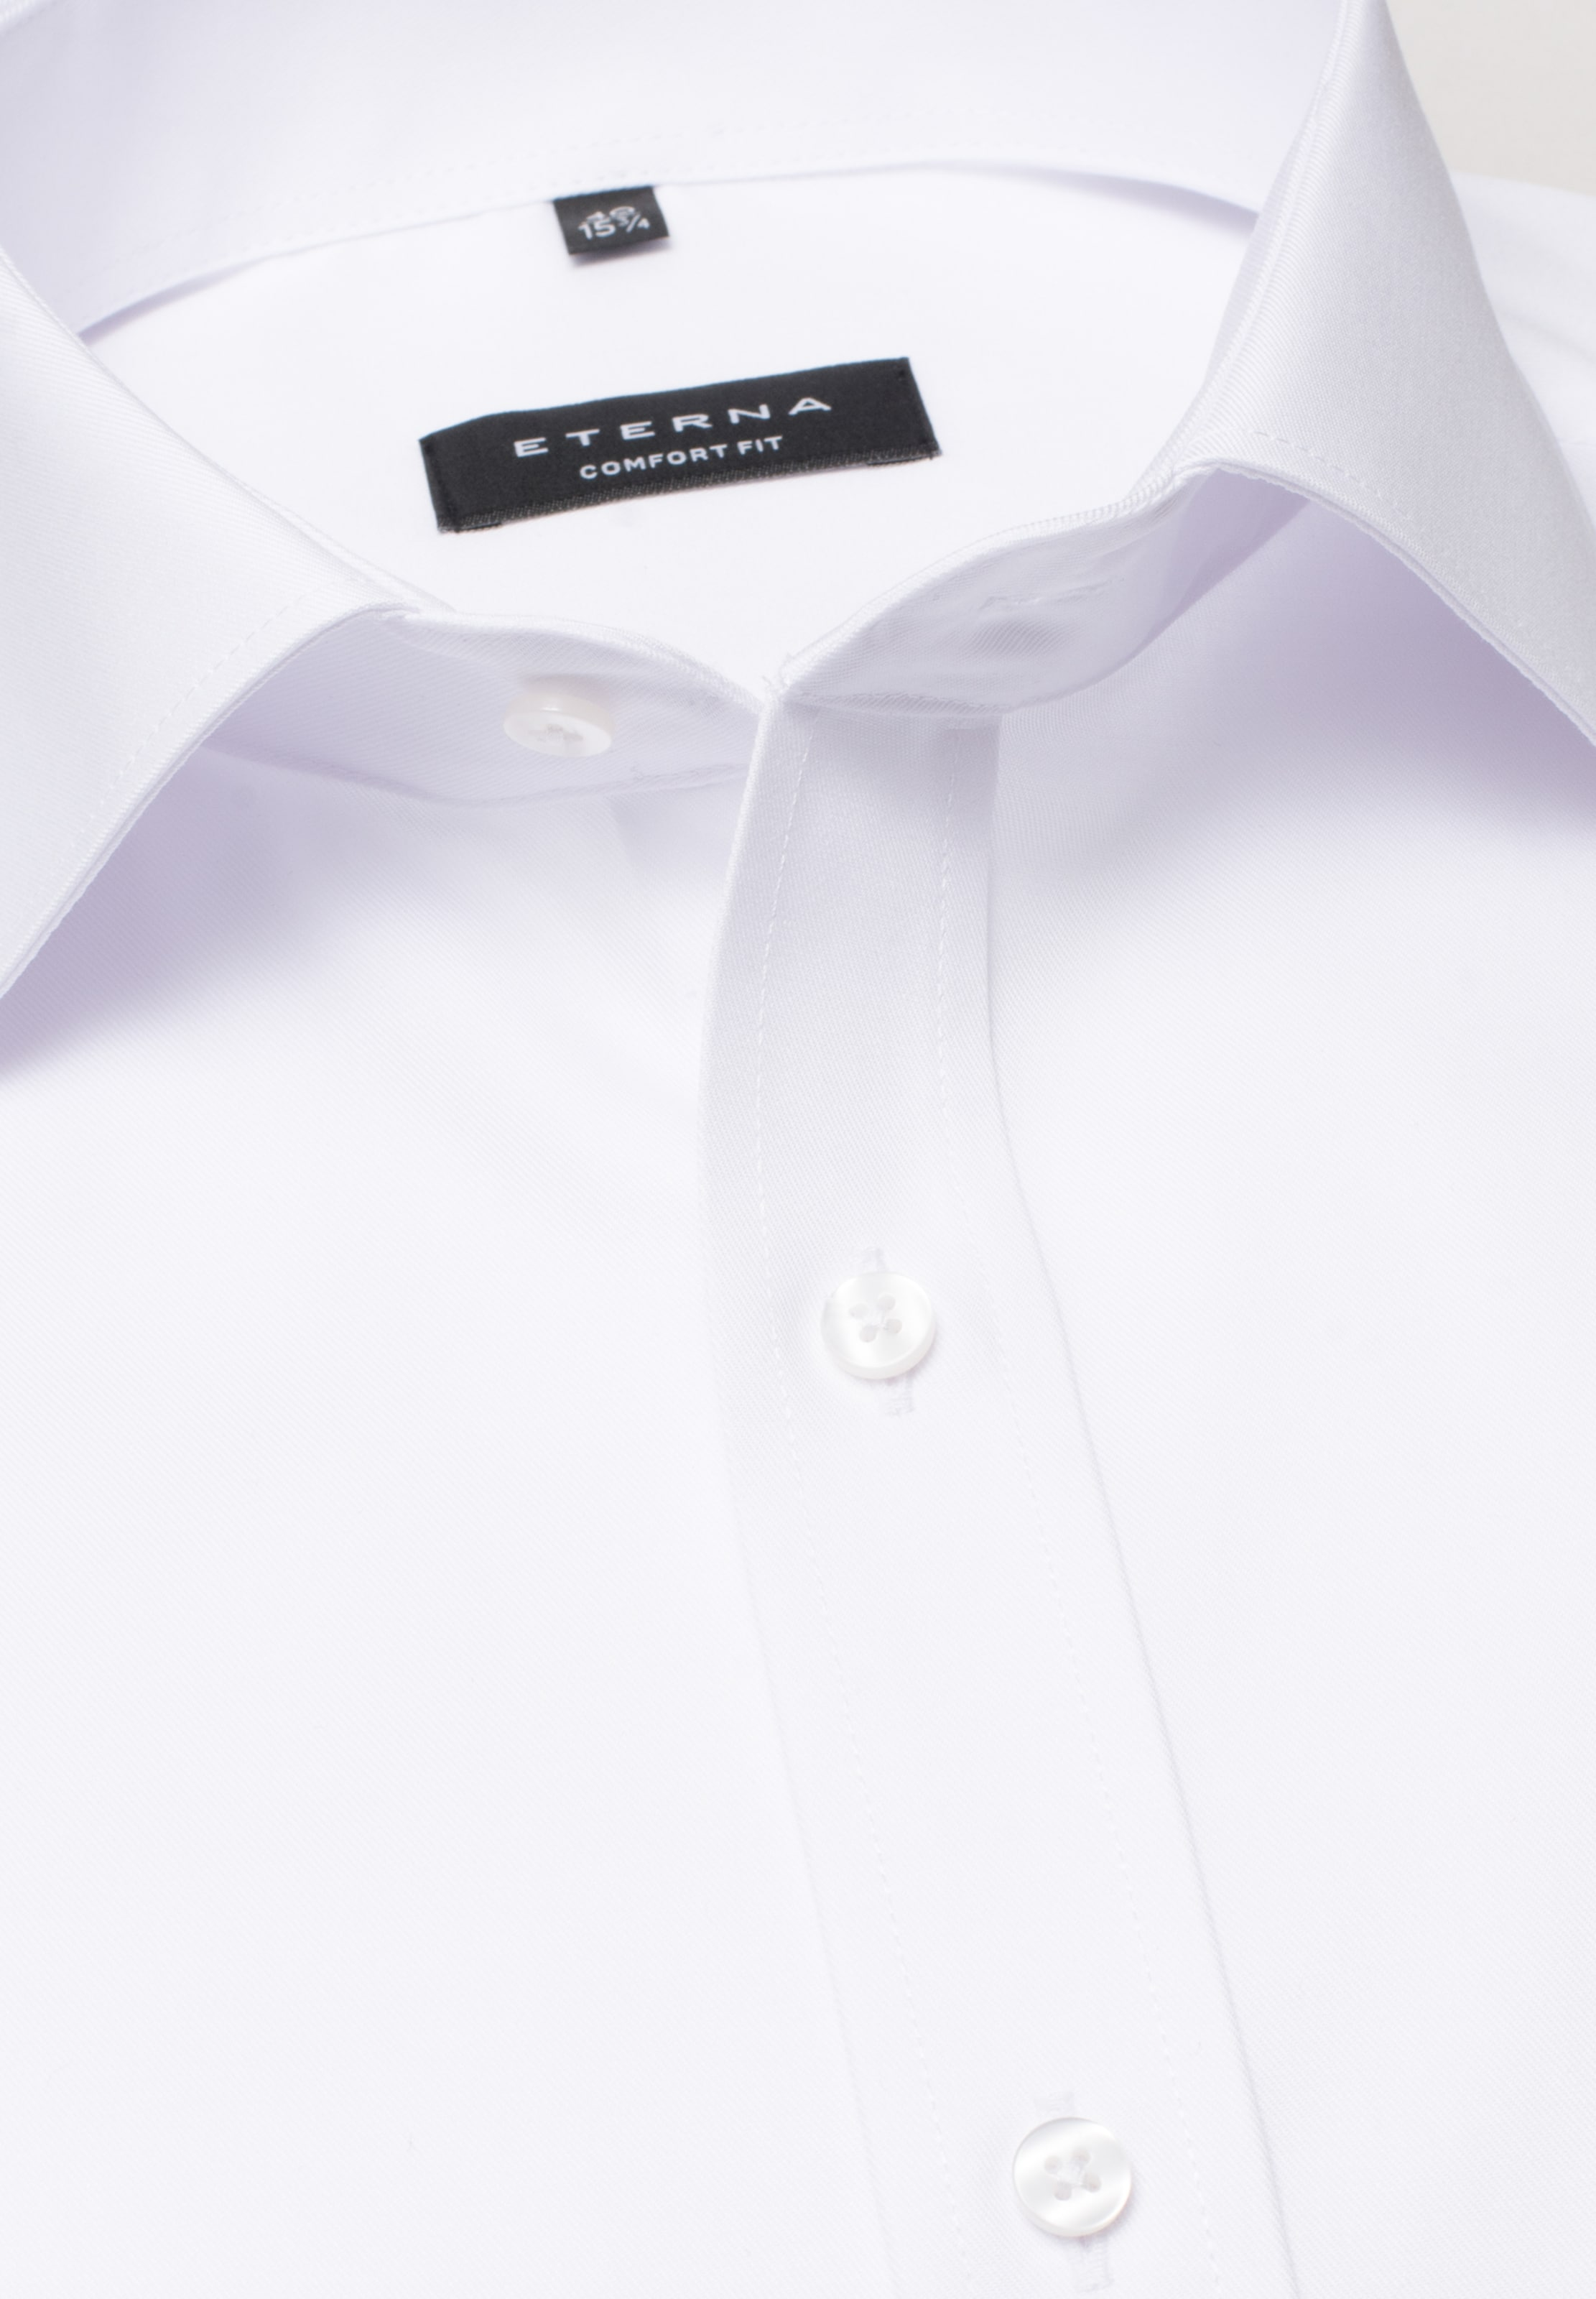 Hemd Hemd In Weiß Eterna Hemd Weiß Weiß In Eterna In Eterna Eterna In Hemd tsrxhdQC